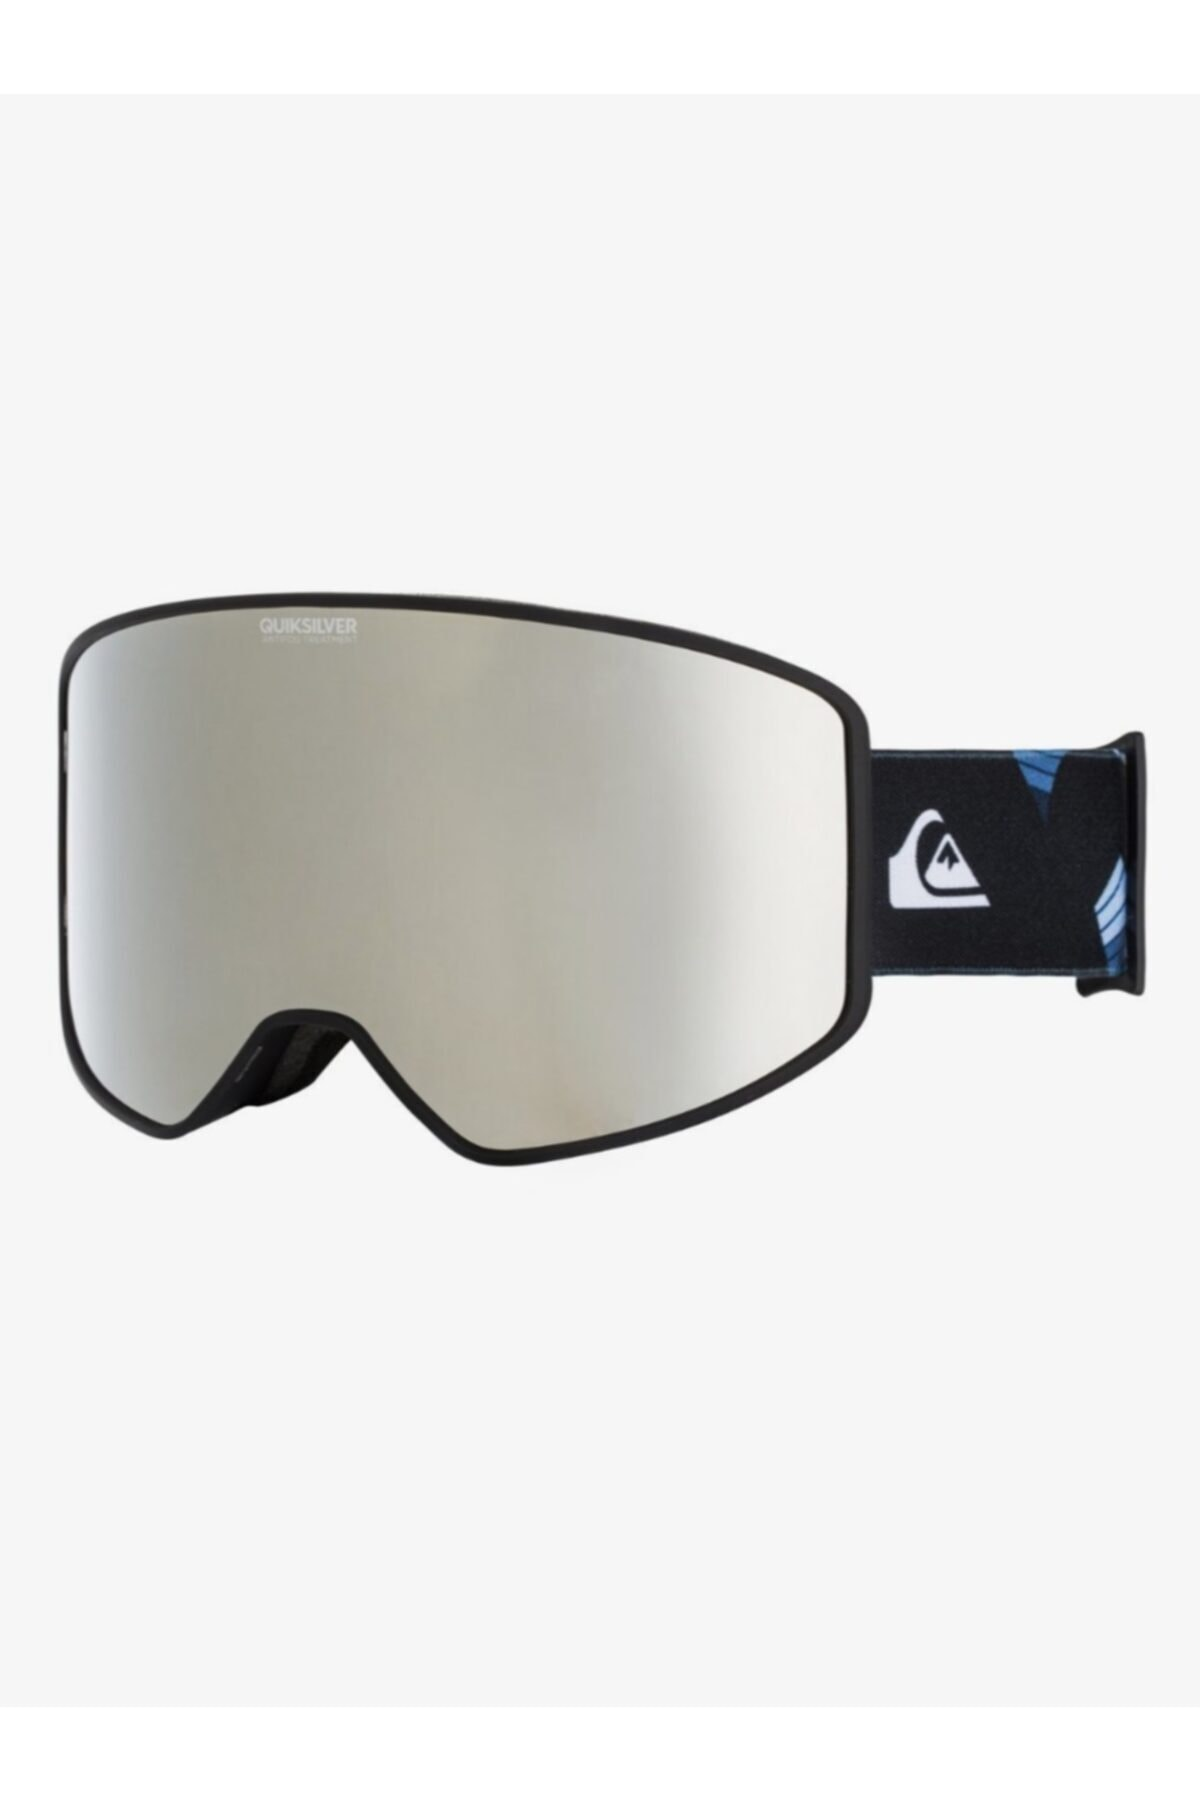 Quiksilver Quıksılver Storm Sportlıne M Sngg Kayak/snowboard Gözlüğü Eqytg03118-kvj0 1